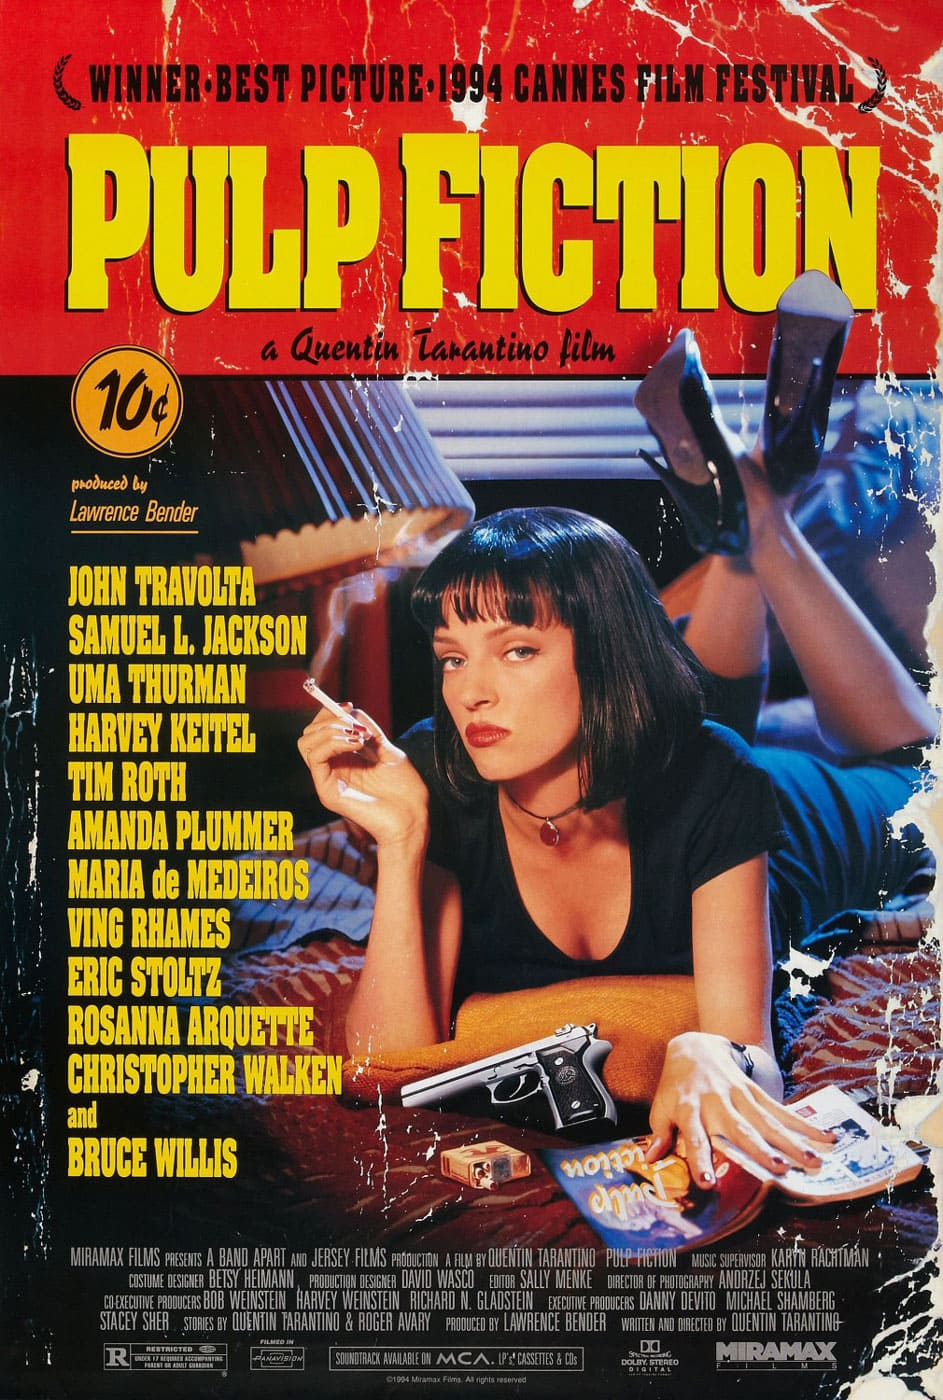 Película - Pulp Fiction - Quentin Tarantino (1994)